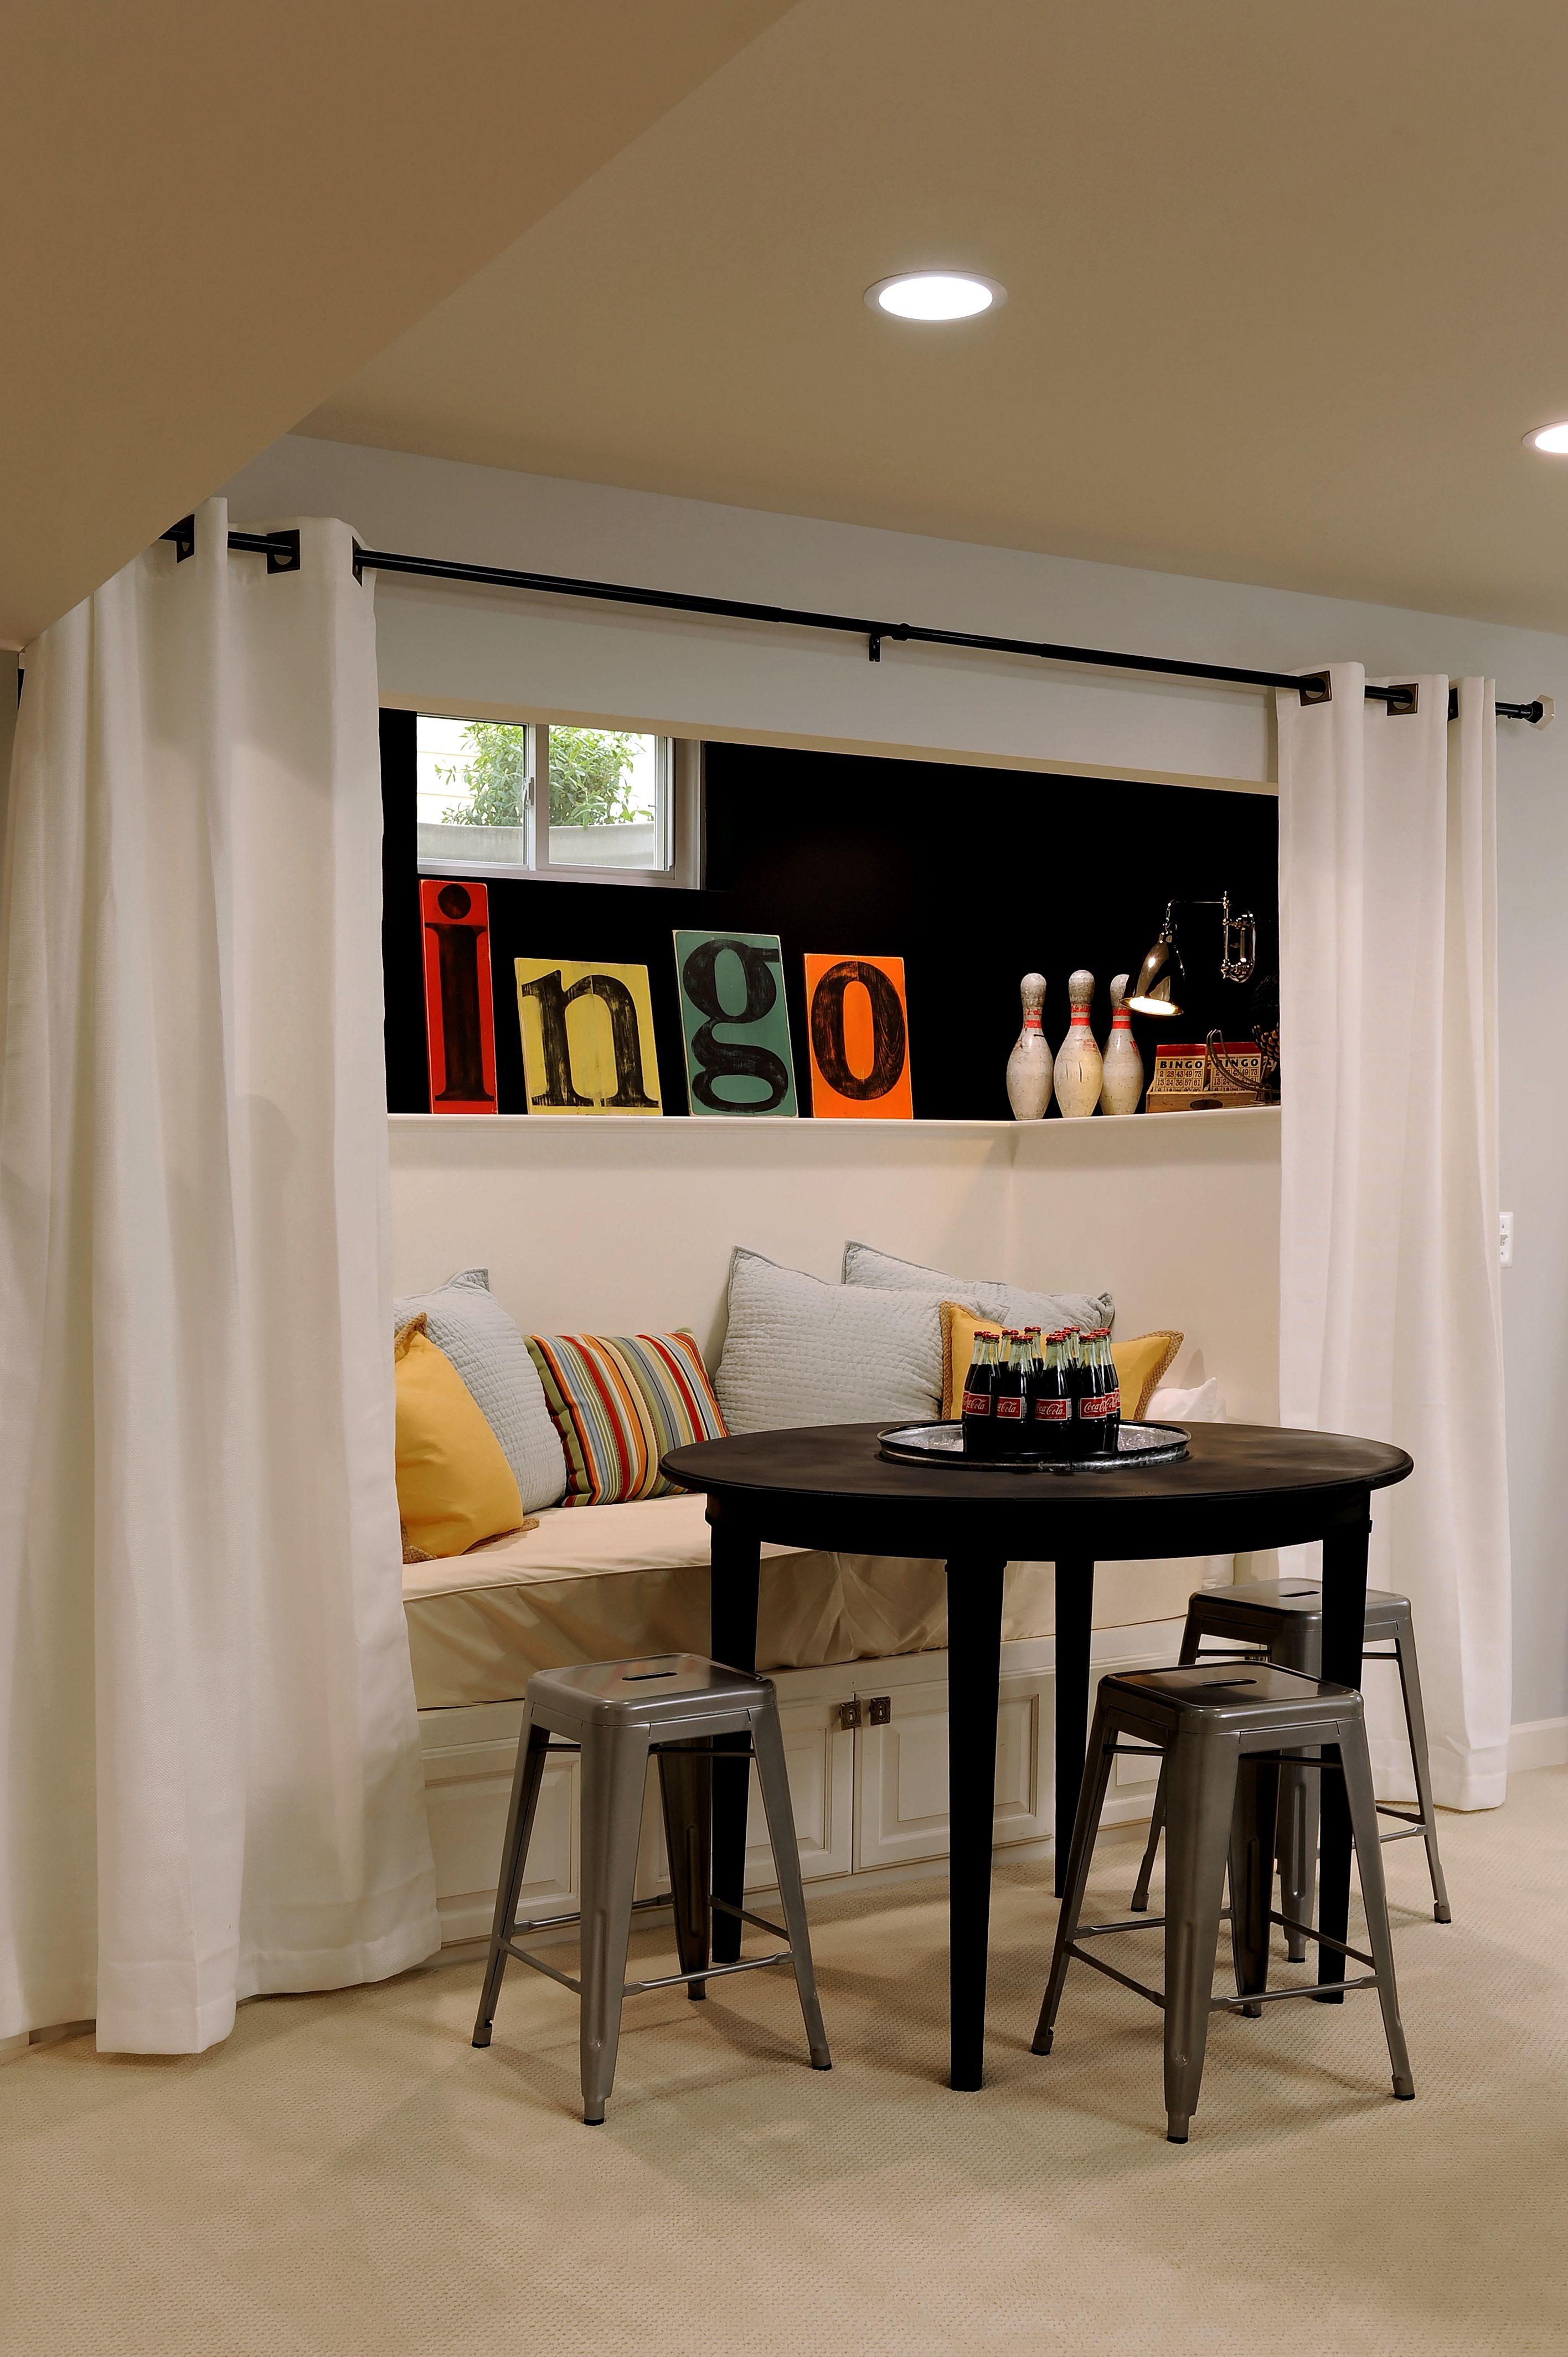 Basement Sleeping Nook  Home Decor  Pinterest  Sleeping Nook New Private Dining Rooms Richmond Va Inspiration